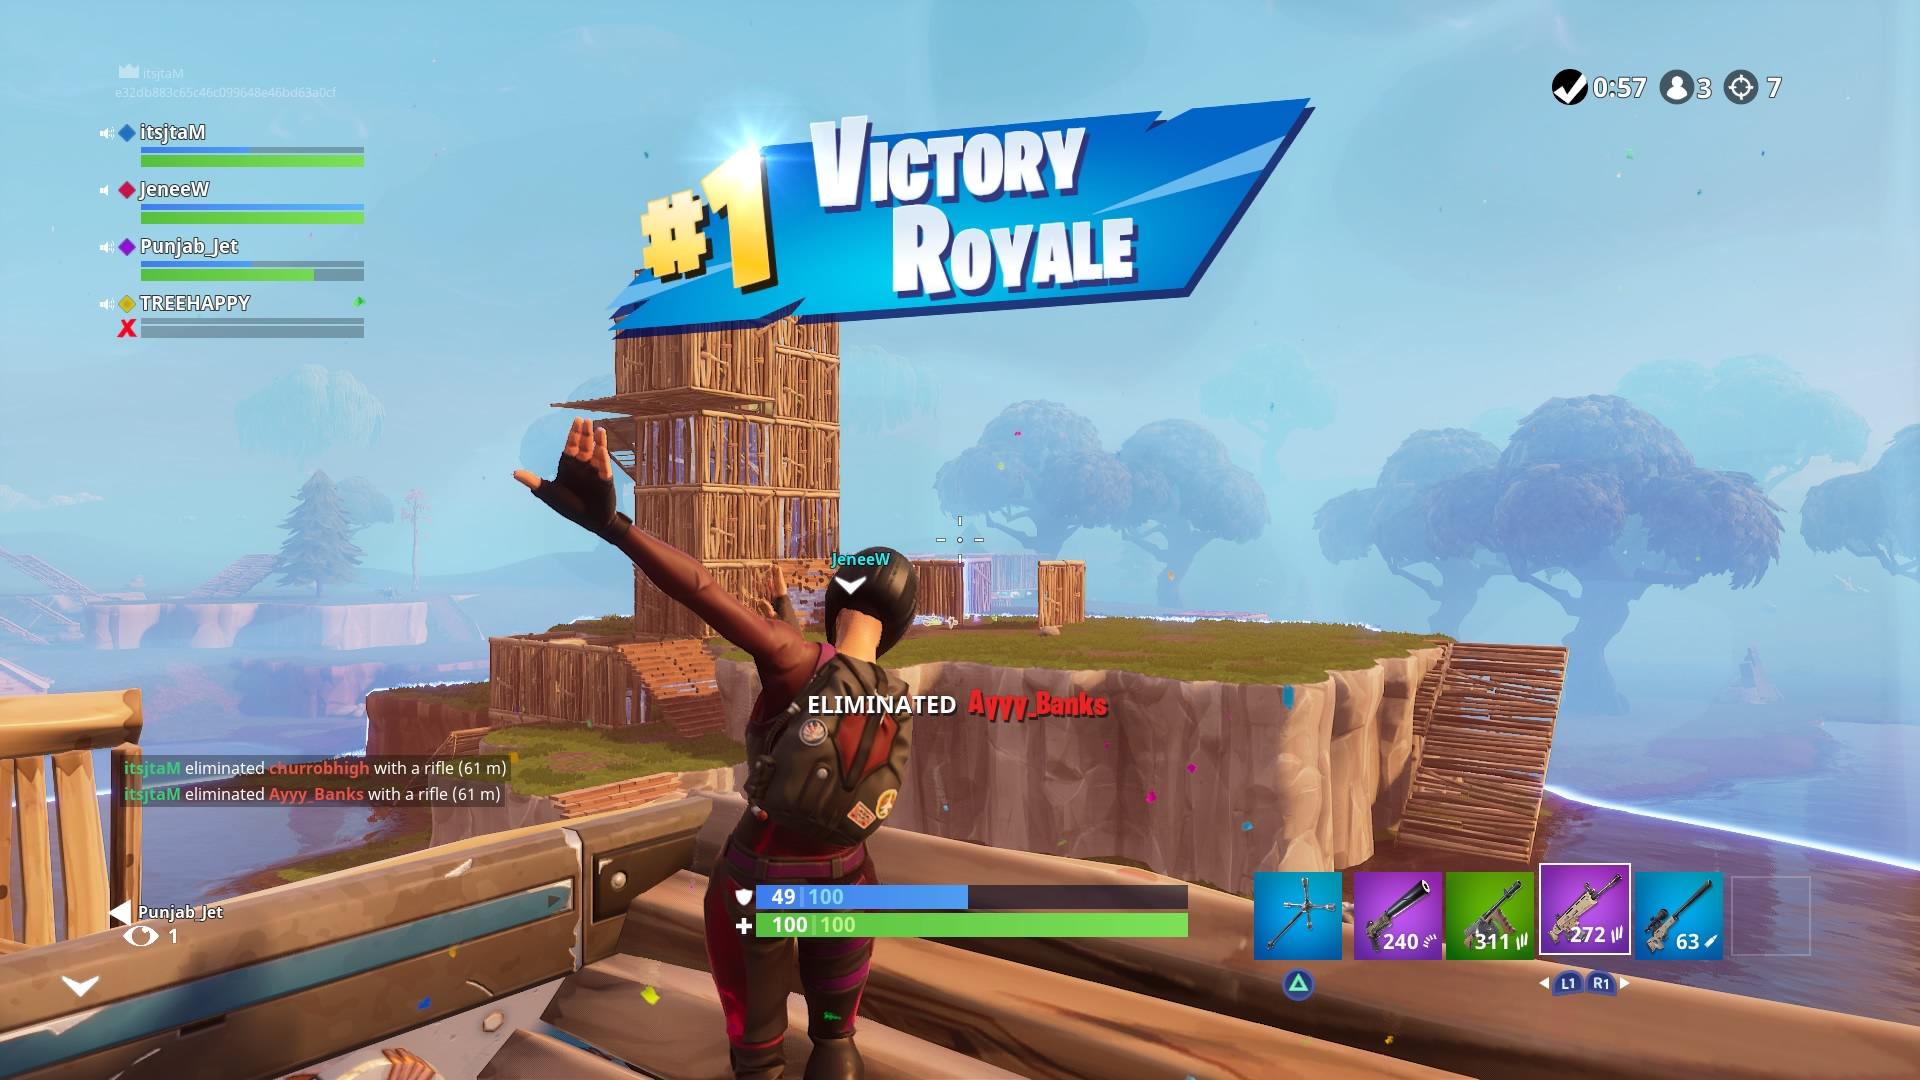 fortnite squad victory wallpaper 64829